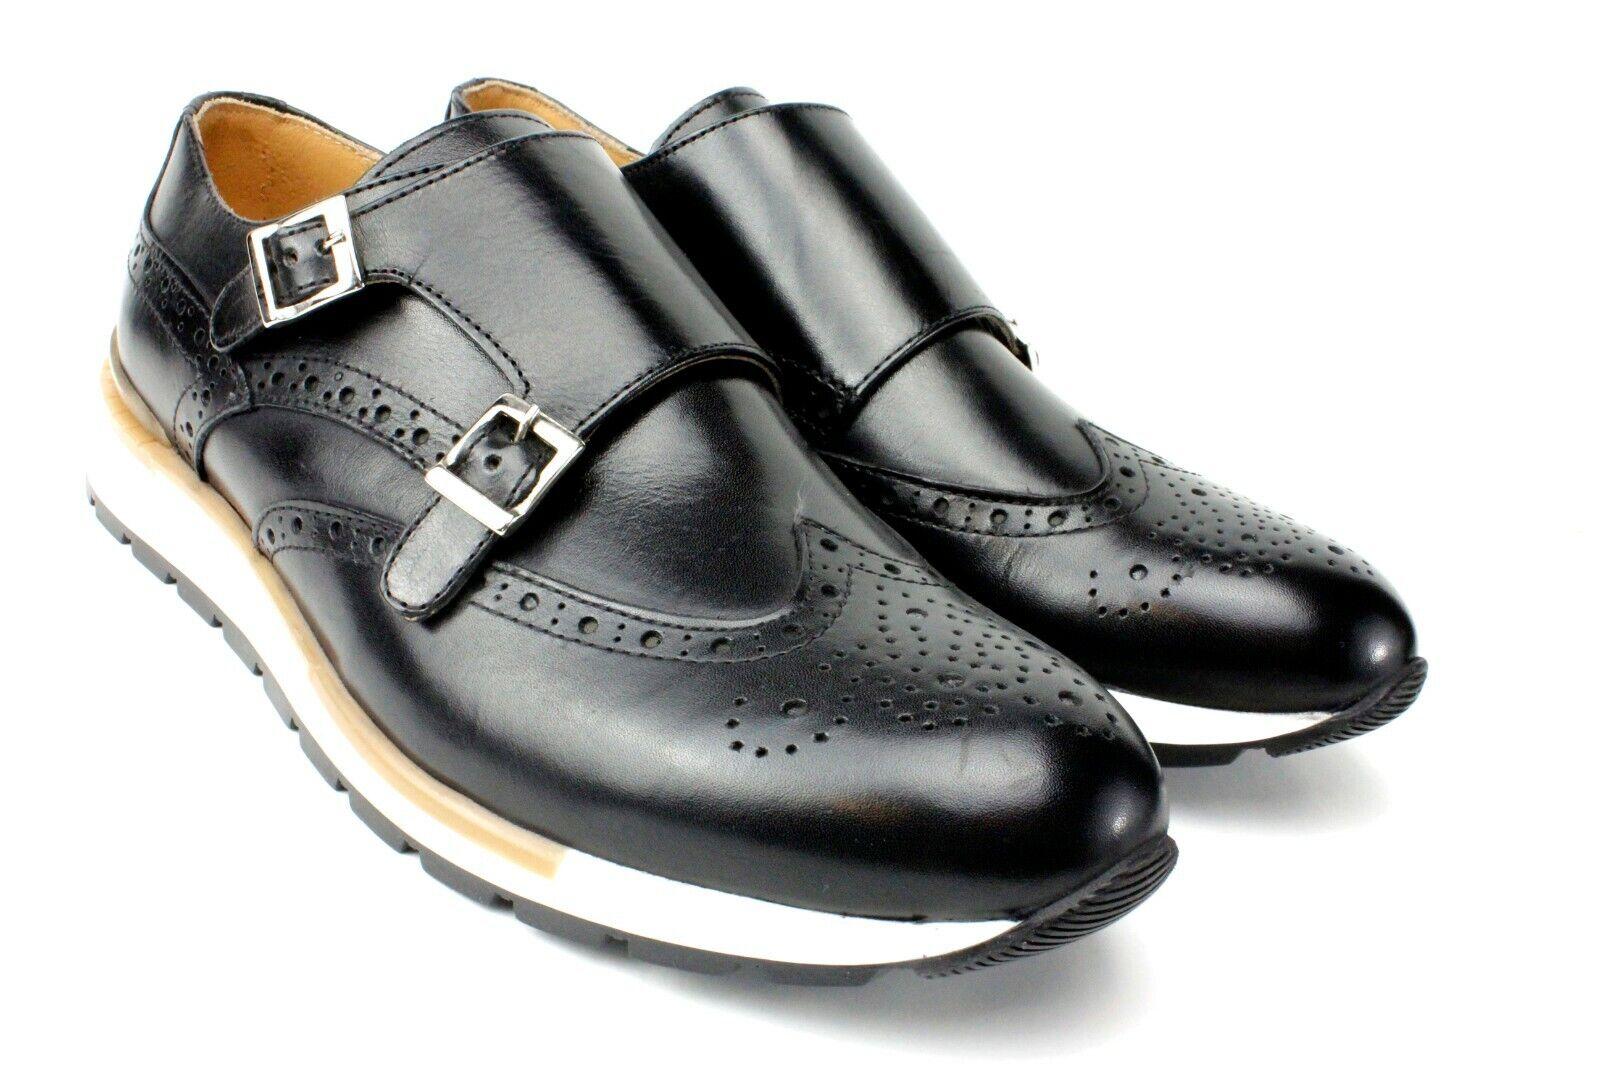 IVAN TROY Arthur Black MonkStrap Italian Leather Dress shoes Oxford Office shoes